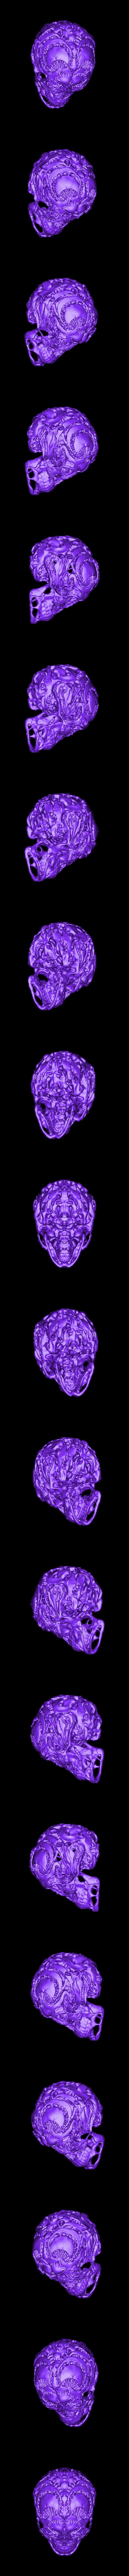 huntersskullremesh.stl Download free OBJ file Hunters - Hunter's Skull • 3D printable template, SYFY